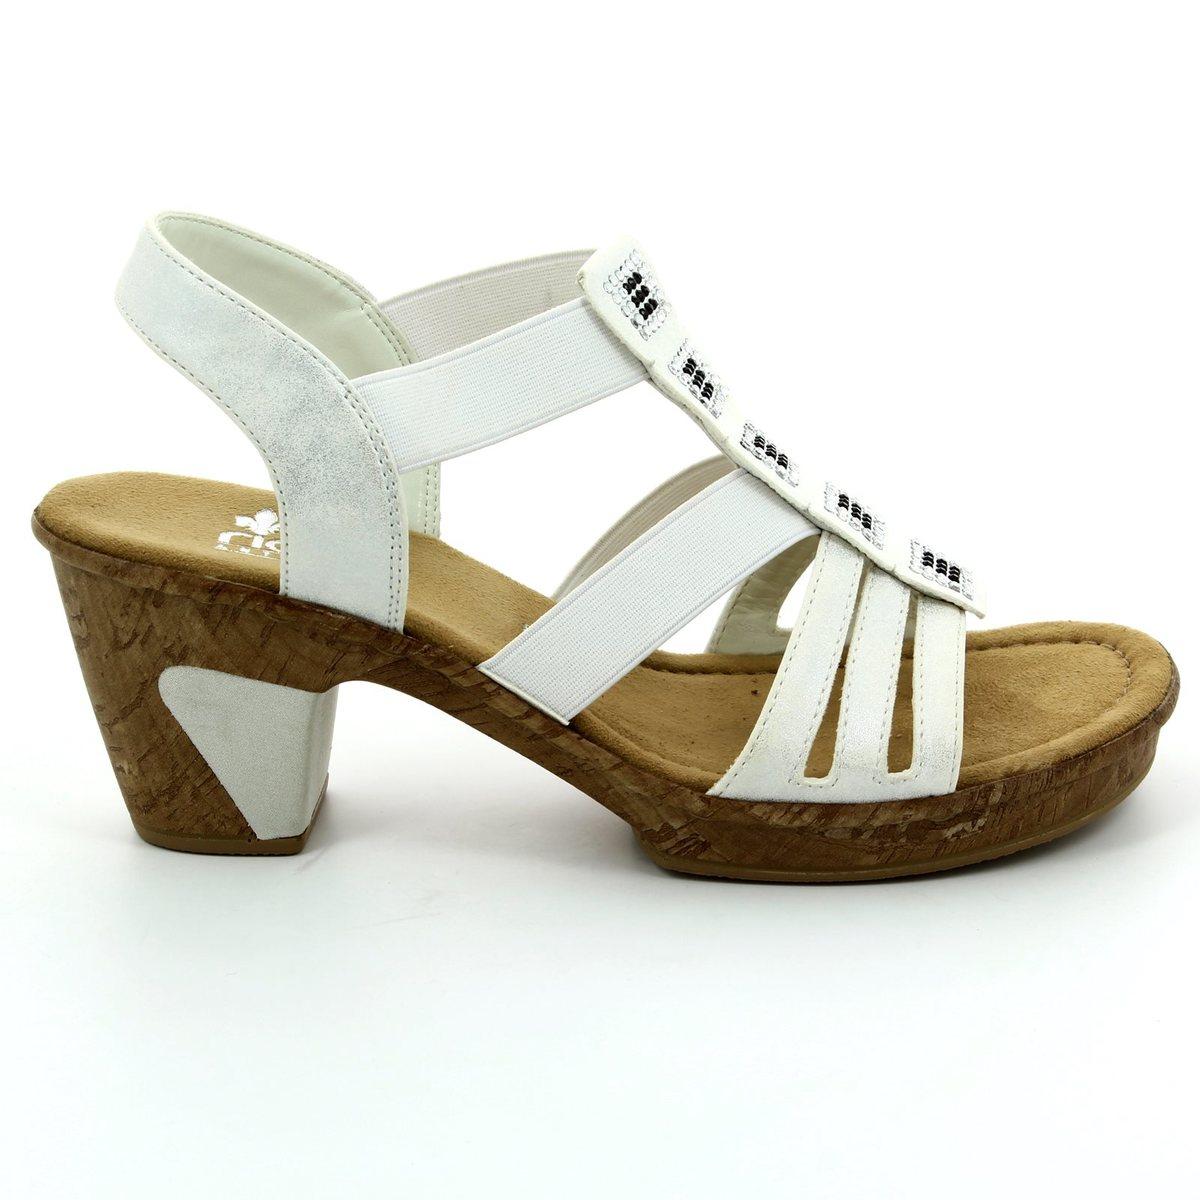 32e22e719d1c9 Rieker Heeled Sandals - Off white - 69761-80 ROBSQUARE